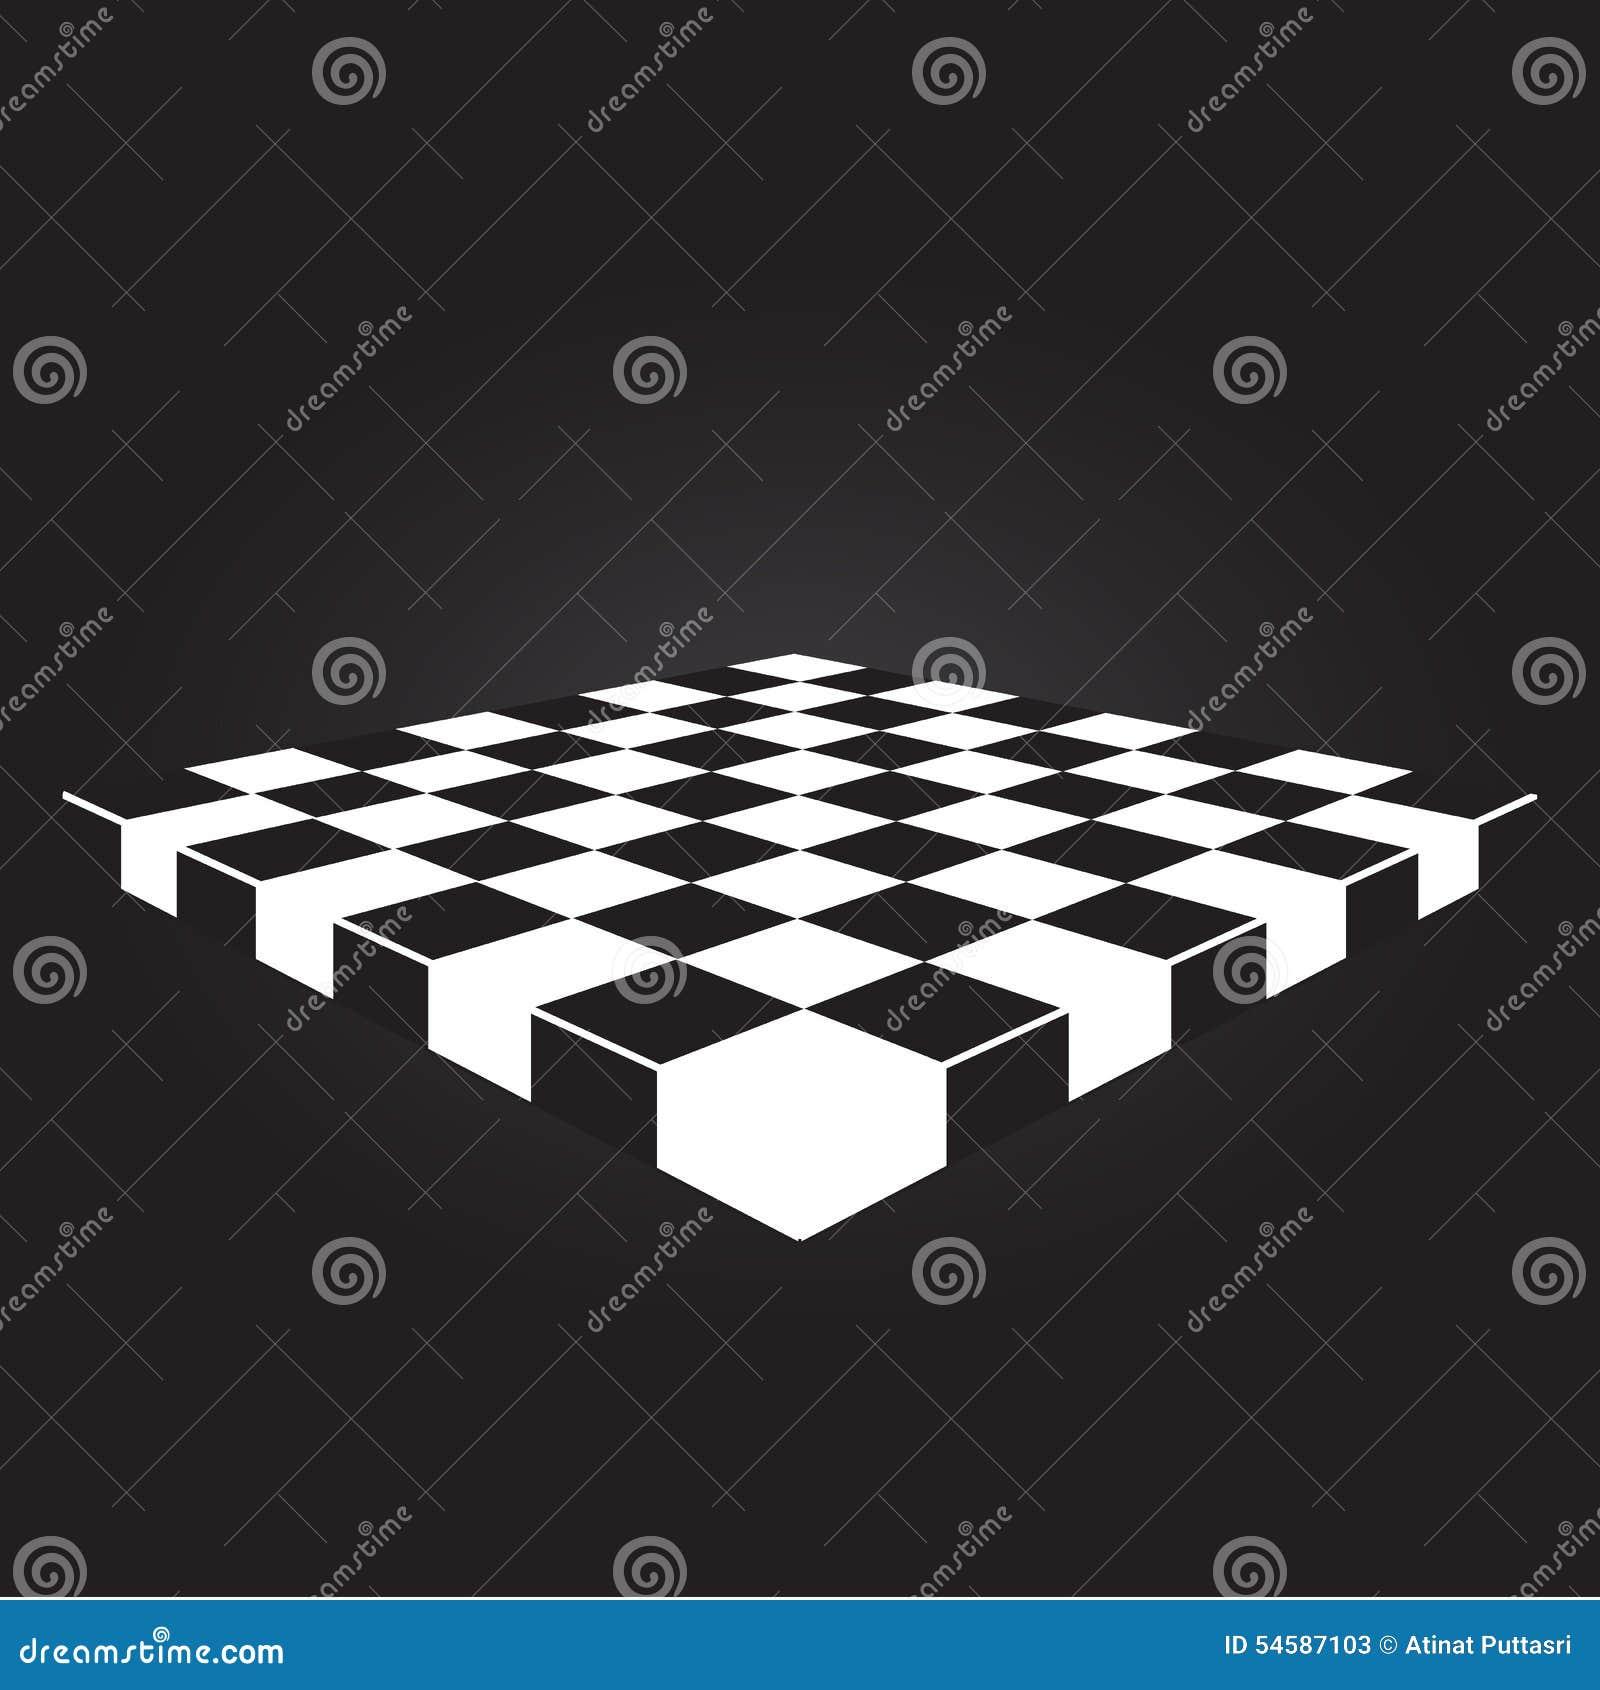 Classic Checkers, Board And Checkers. Vector Illustration ...